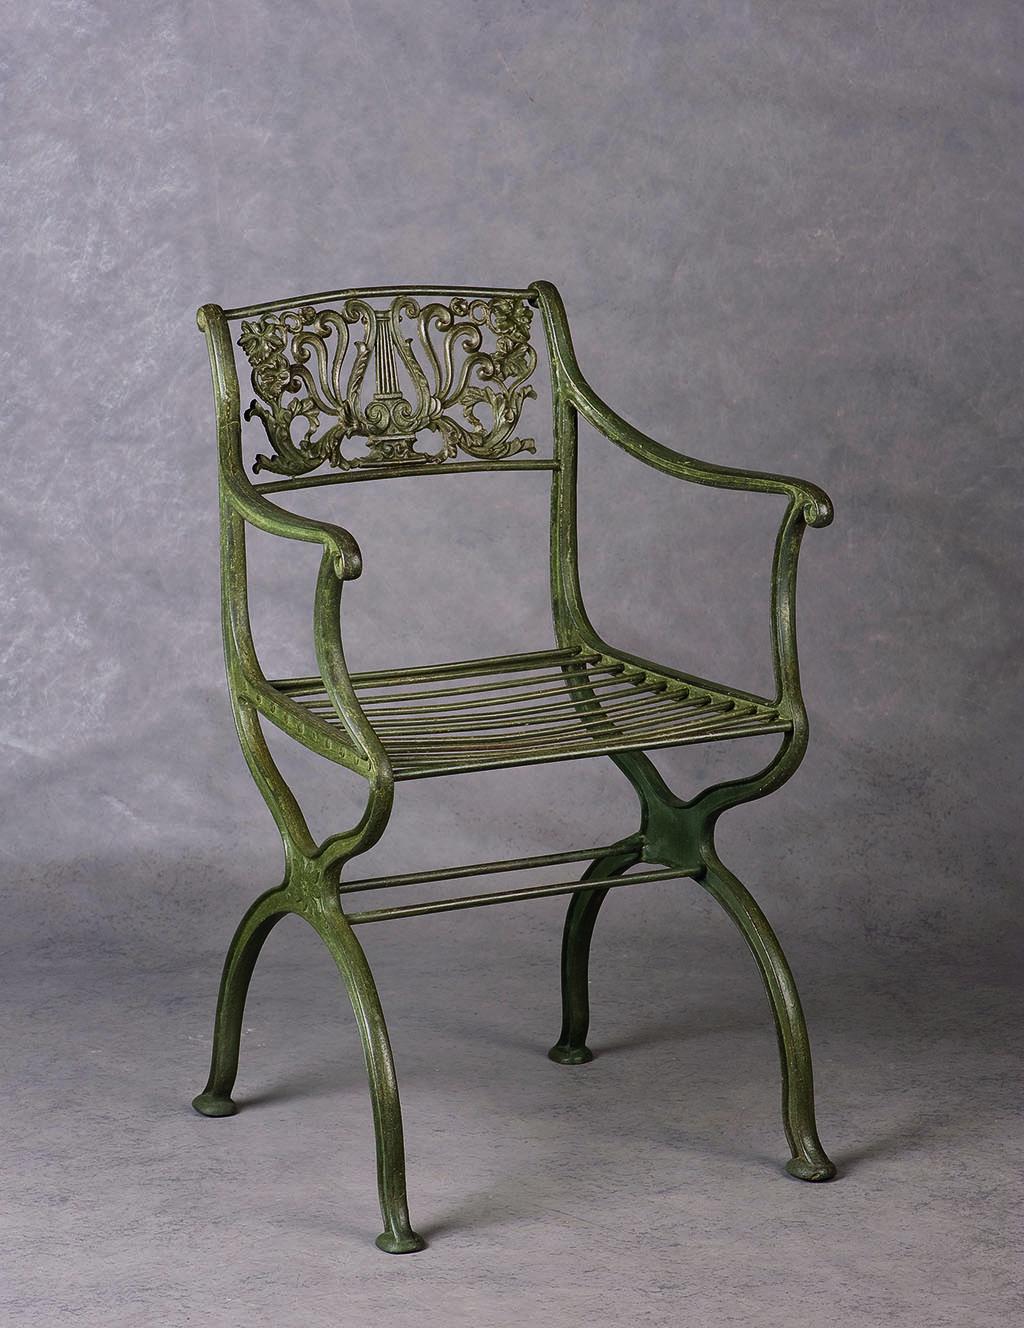 Карл Фридерик Шинкель Садовый стул Чугун, литье, 1830 Галерея «Otto von Mitzlaff», Германия